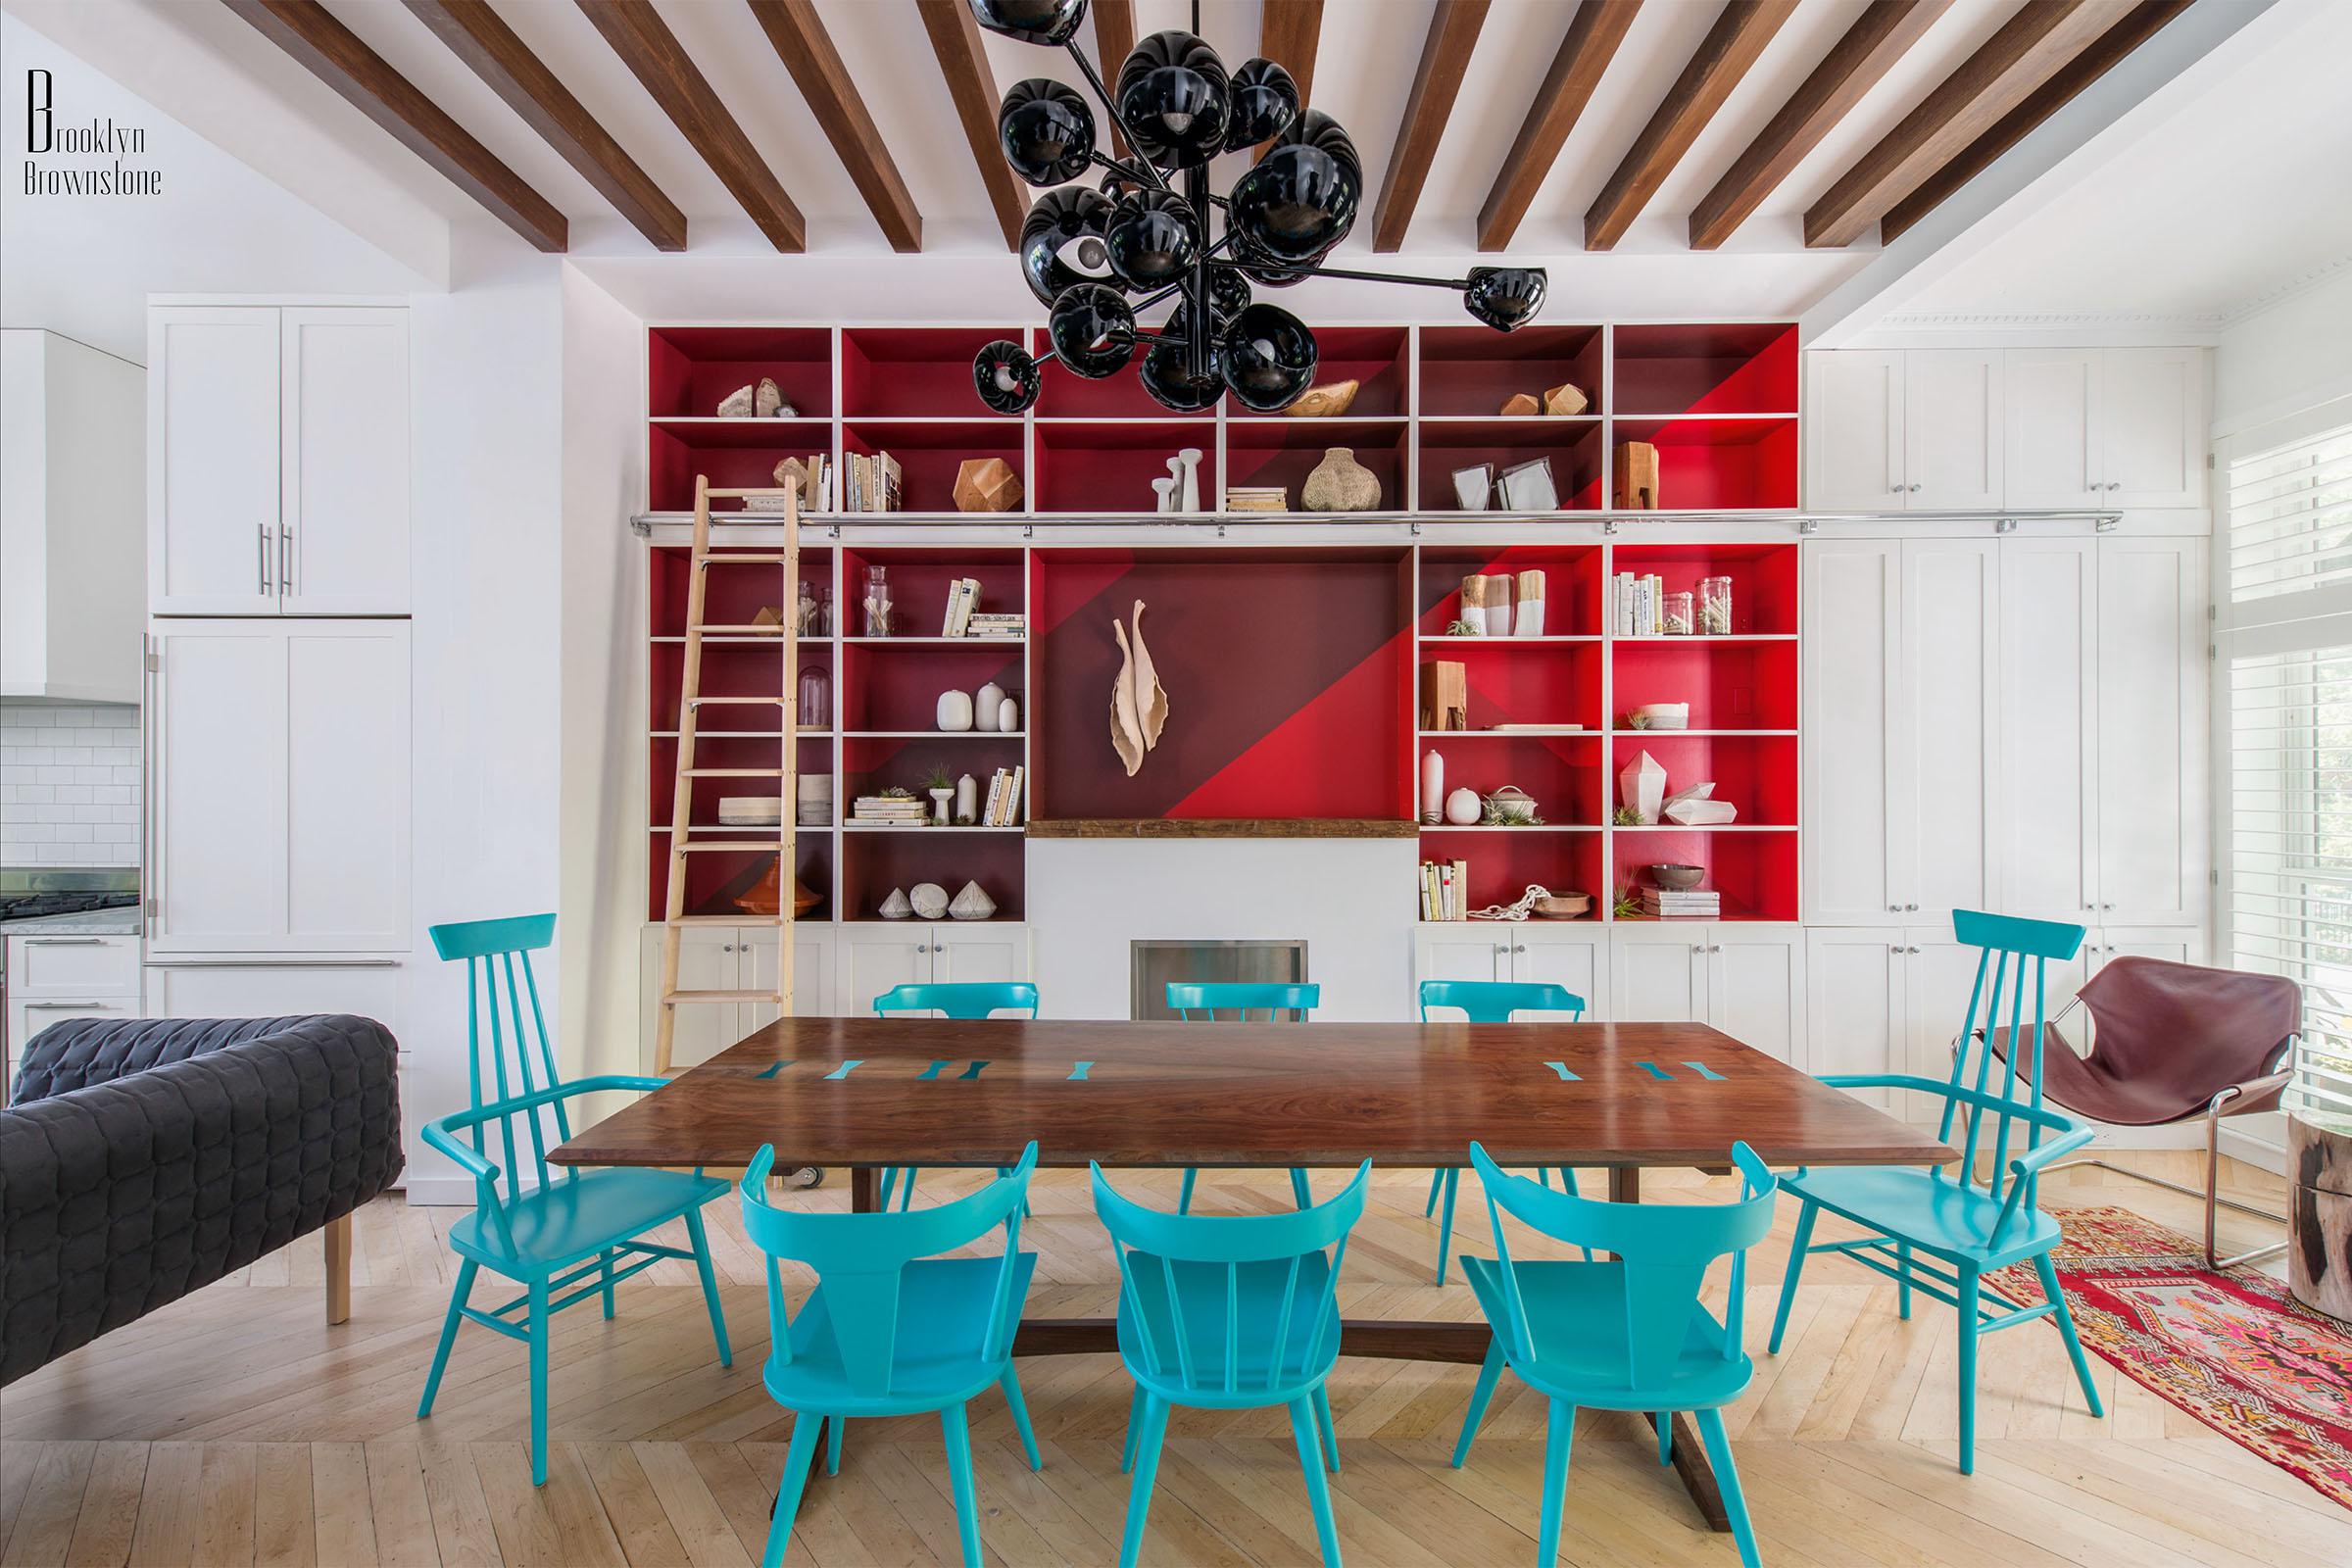 Dining Room Interior Design in Dubai by Luxury Antonovich